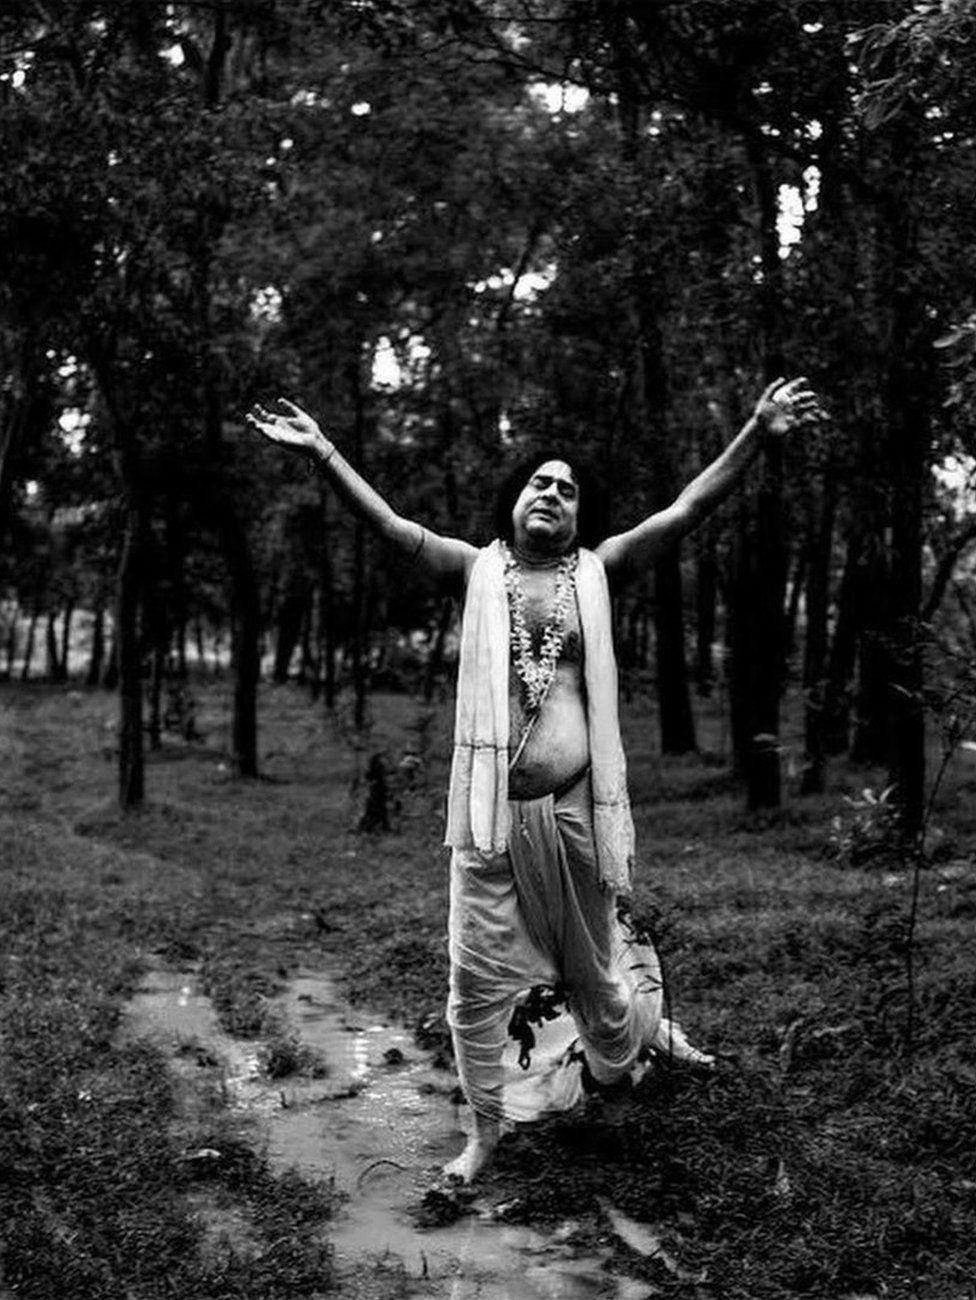 Pradip Kumar Pal(59yrs) is famous for his outstanding portrayal of Sree Chaitanya Mahaprabhu (a Bhakti saint from Bengal). He runs a stationary shop now. Gambhira Nagar, India.